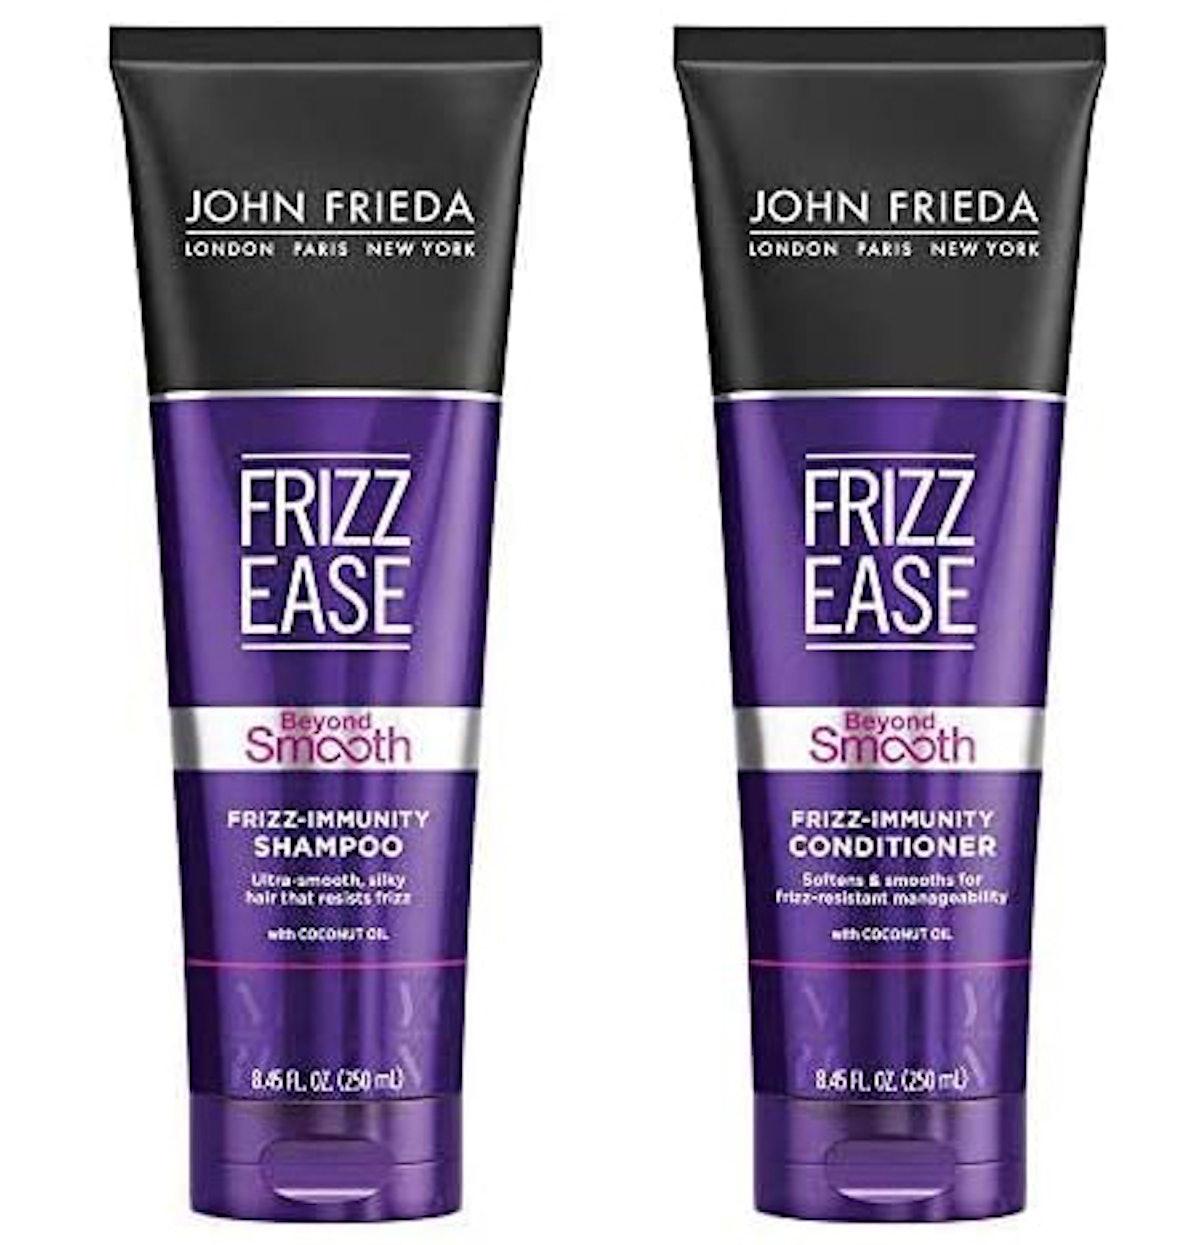 John Frieda Frizz Ease Beyond Smooth Frizz-Immunity Shampoo & Conditioner